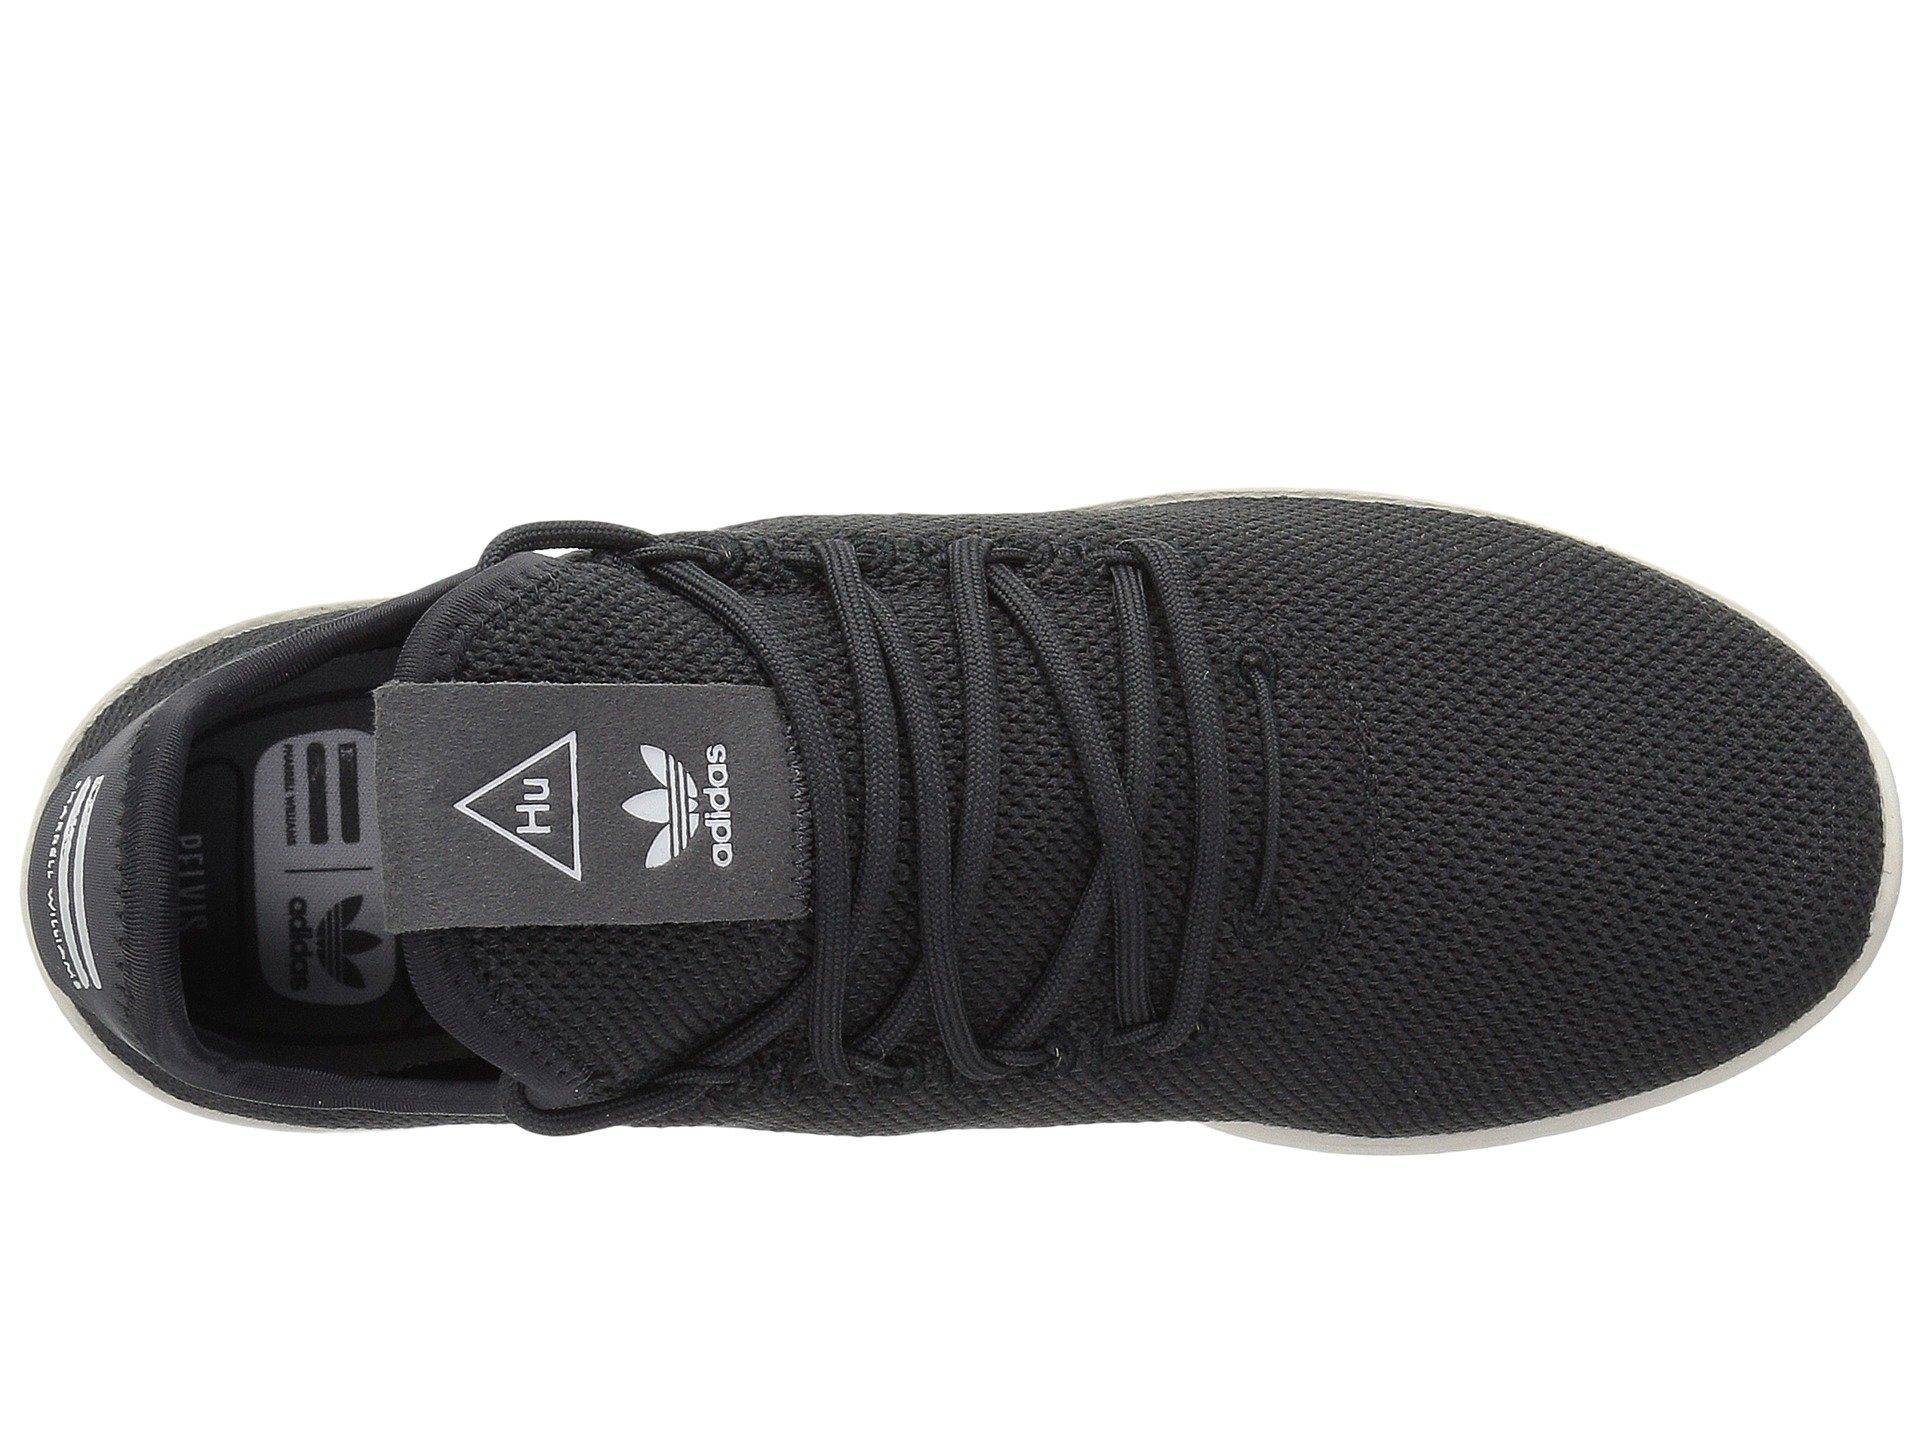 e5c205aa720fc Acquista adidas pharrell williams black - OFF68% sconti